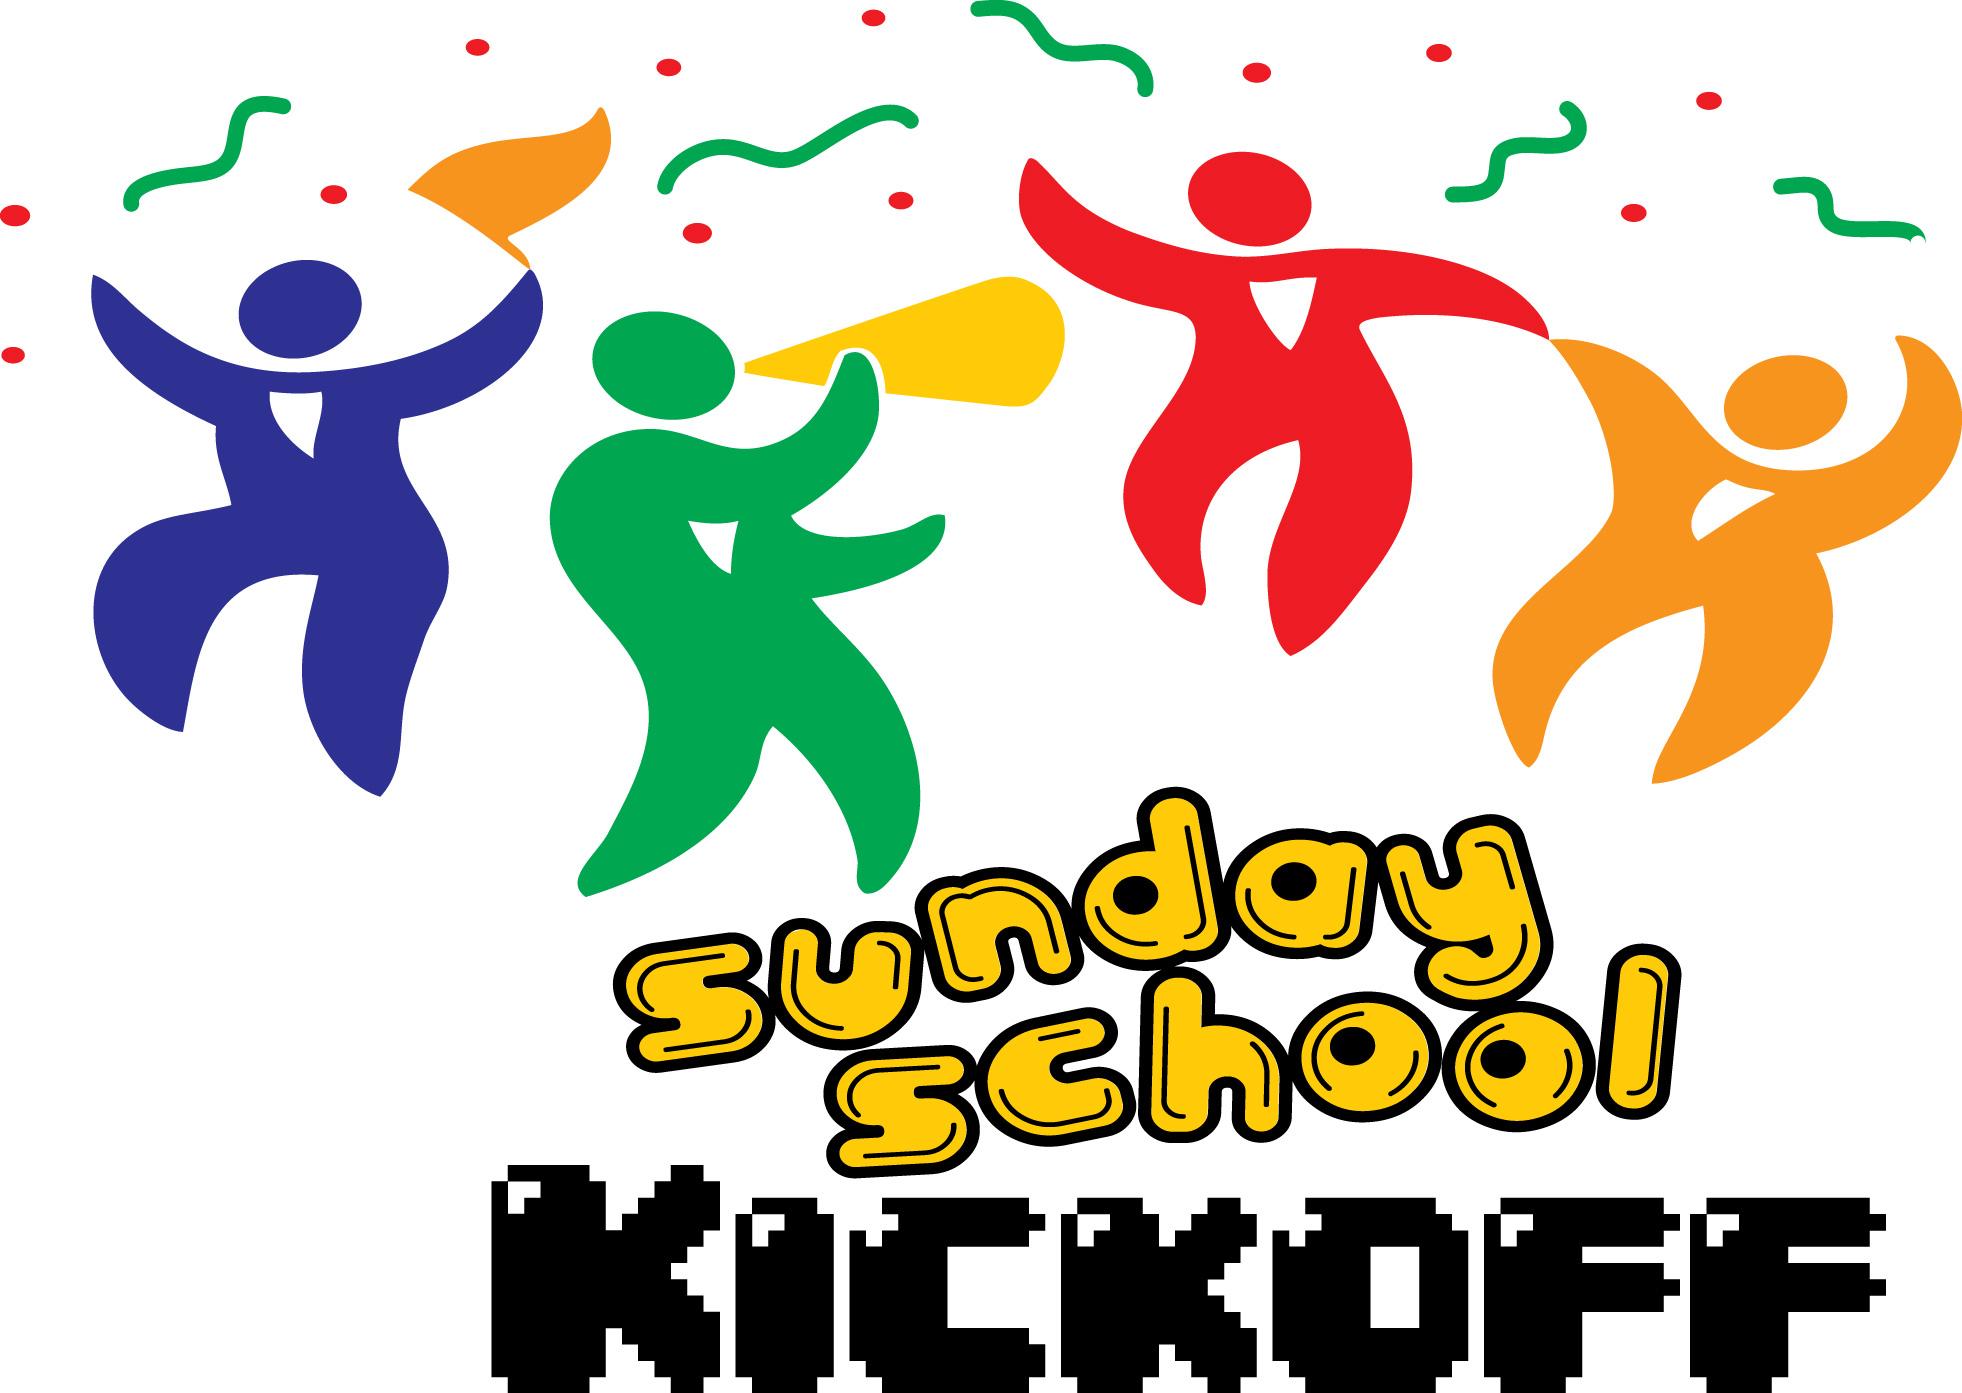 sunday school clip art clipart panda free clipart images rh clipartpanda com sunday school clipart church sunday school clipart free download